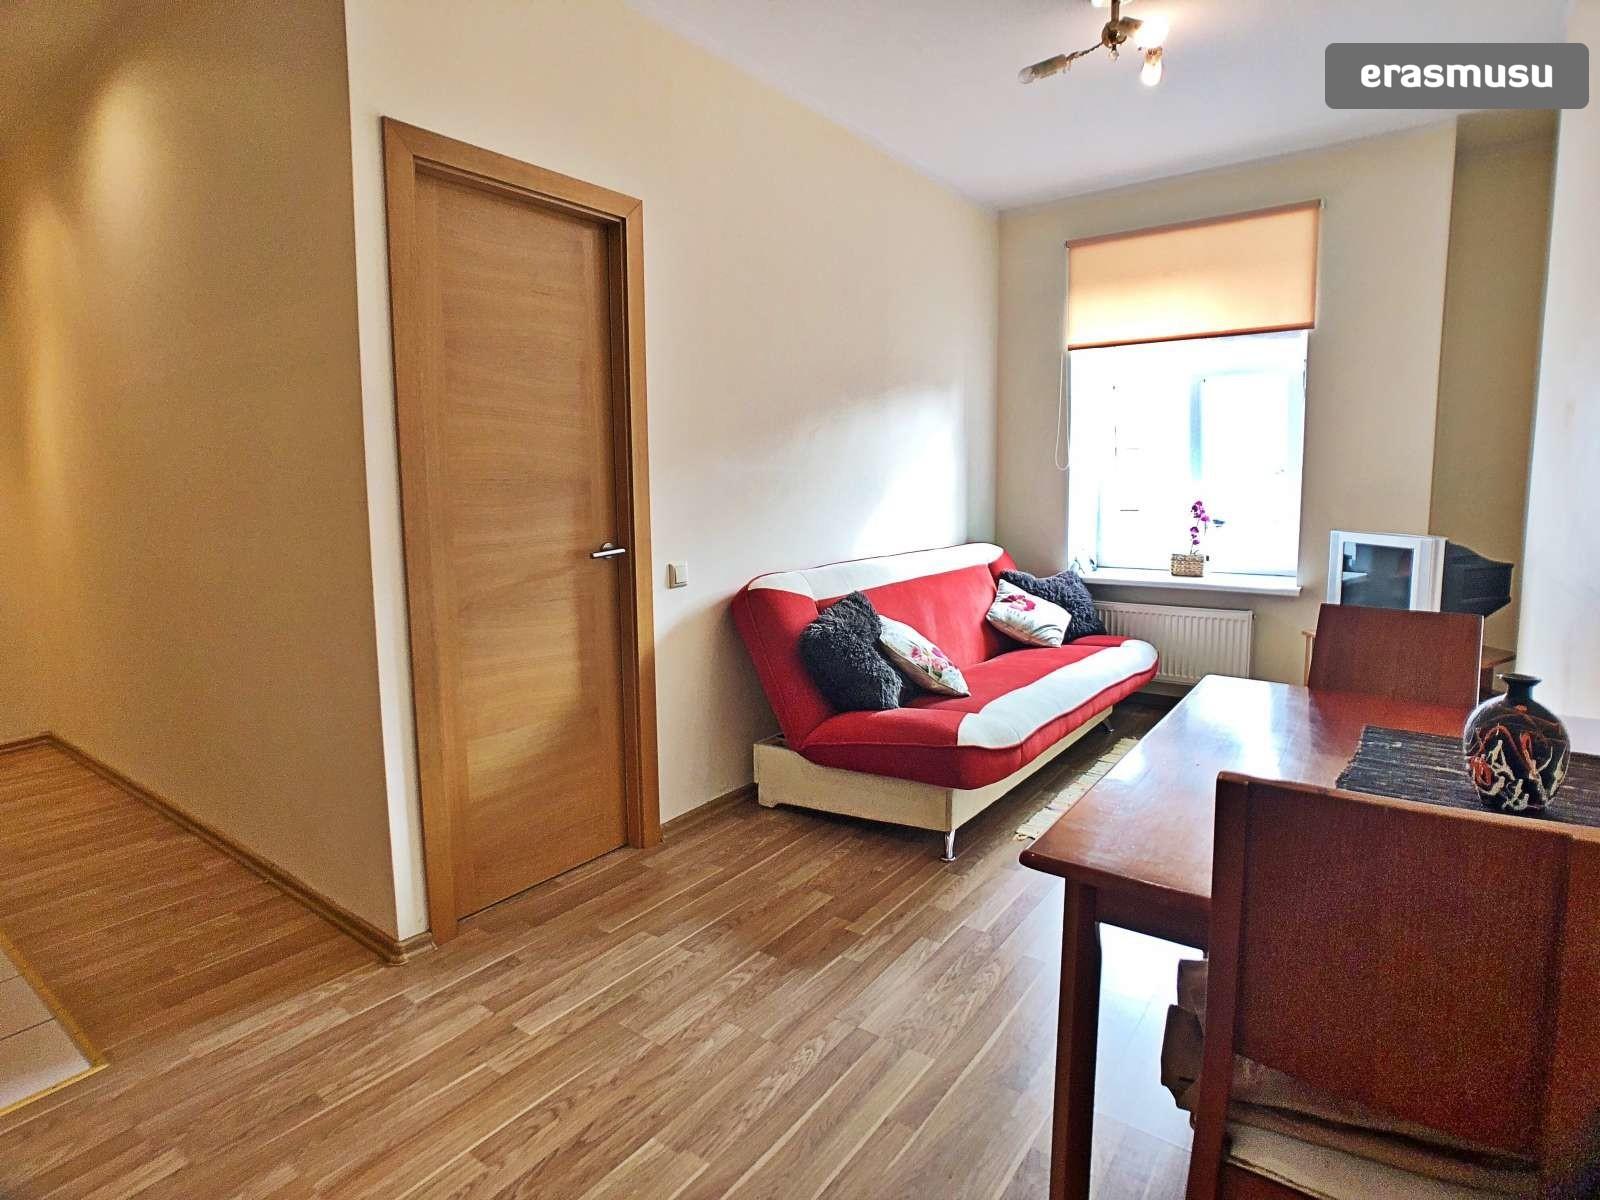 modern-1-bedroom-apartment-rent-maskavas-forstate-d3aae9983e152a